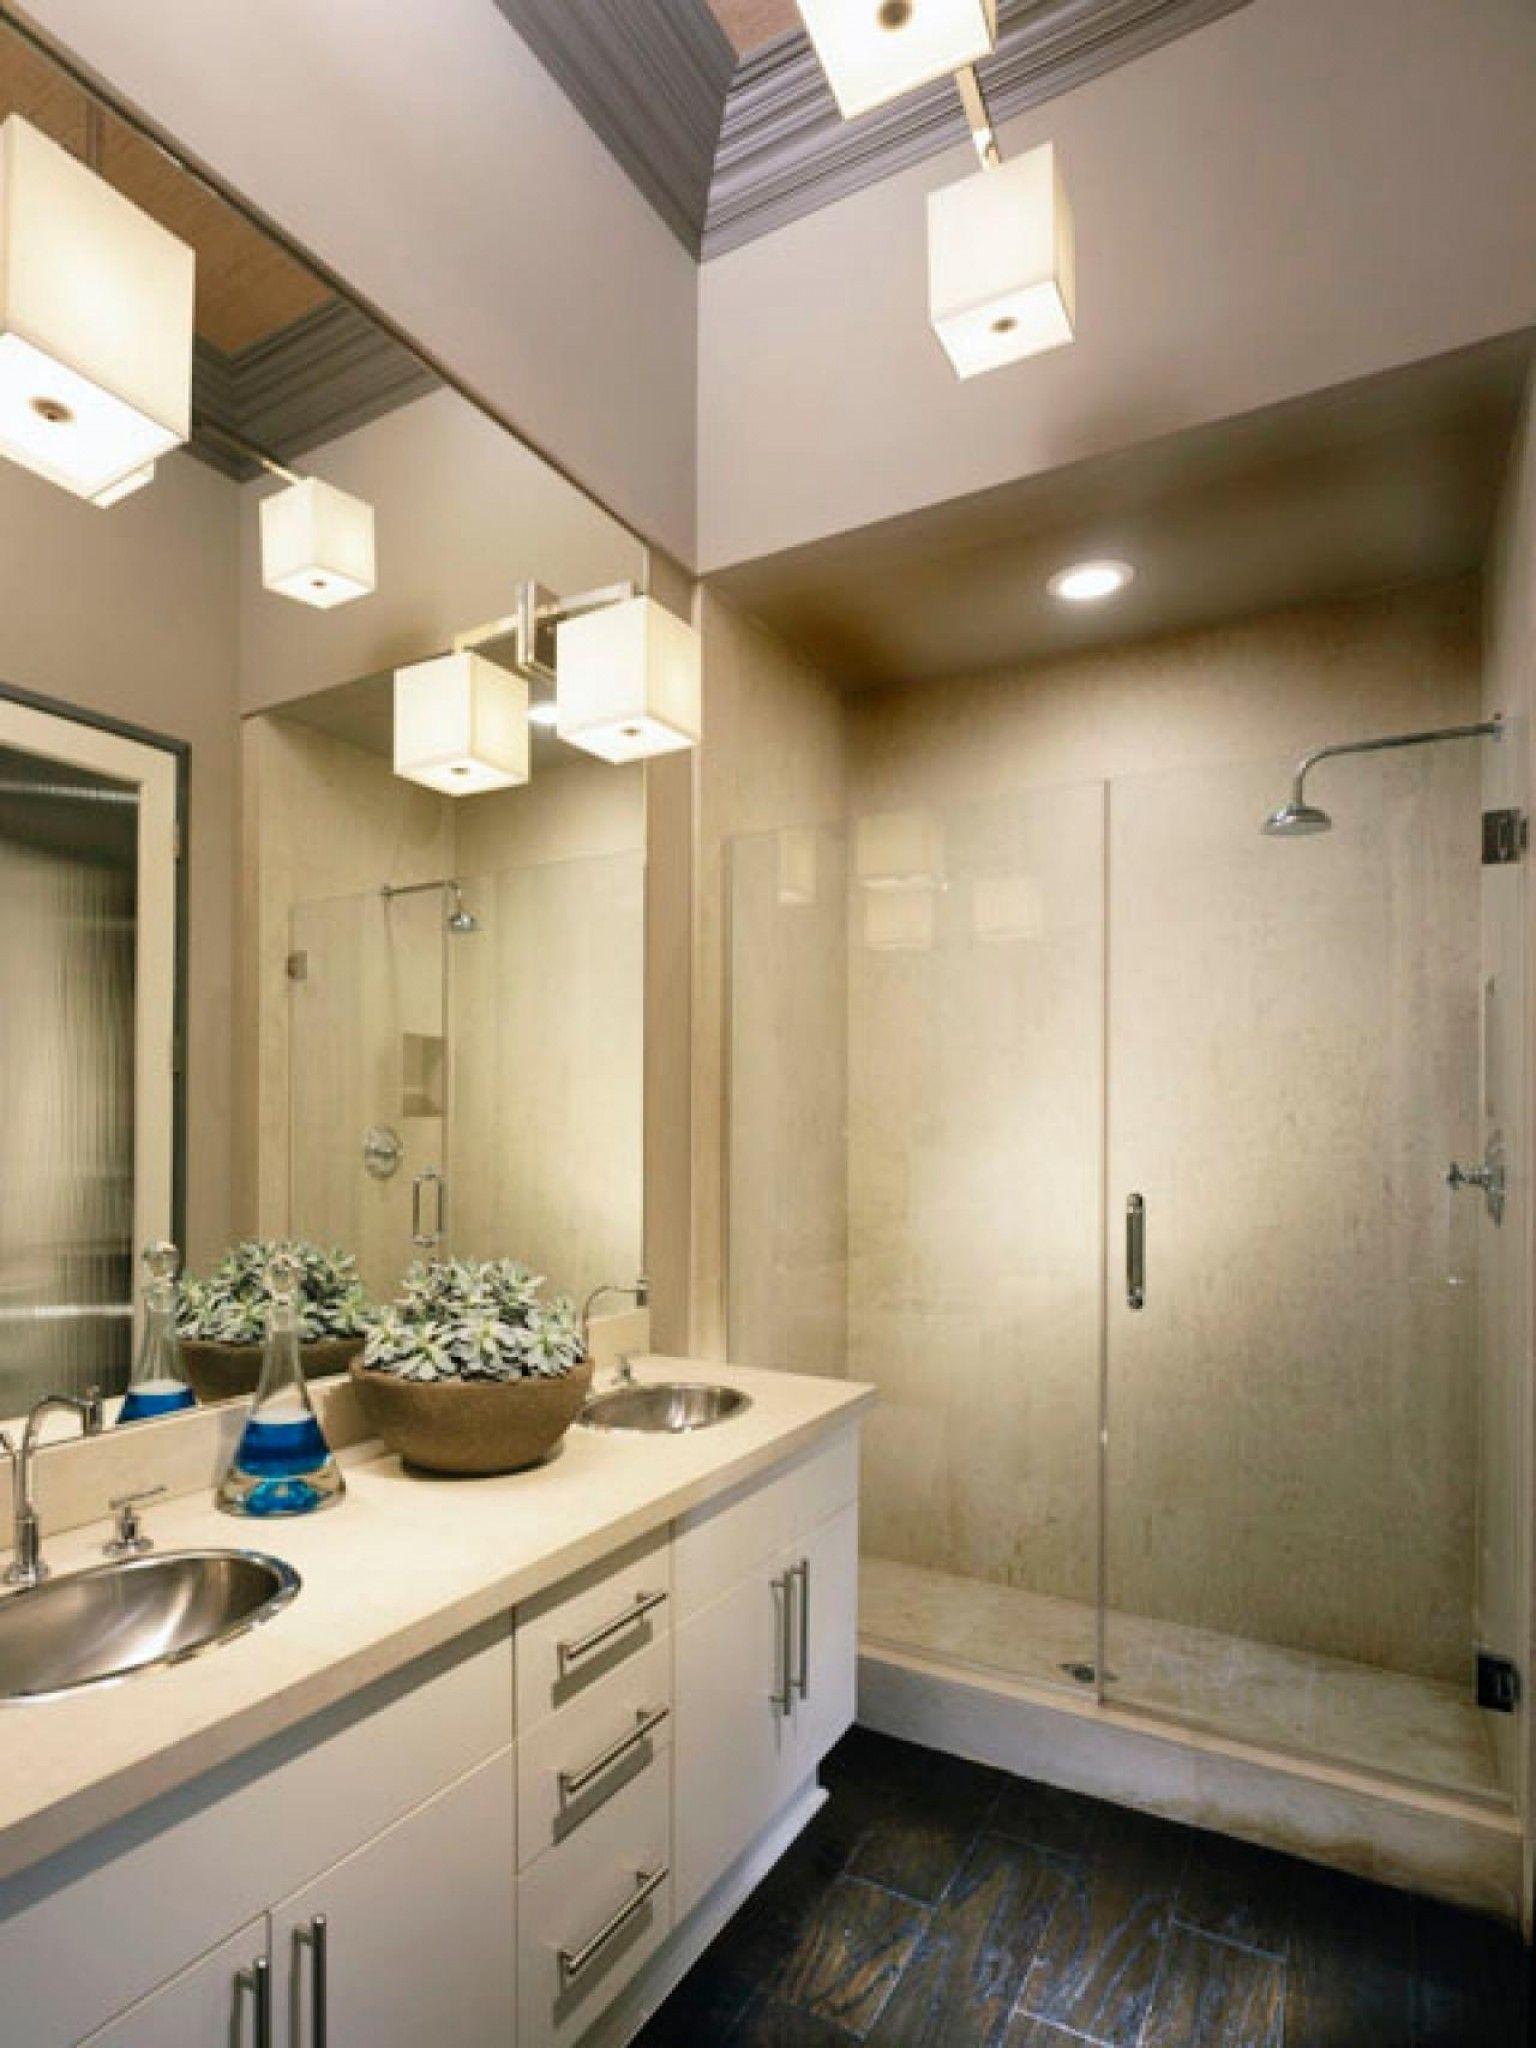 Inspiring Bathroom Designs For The Soul 5x12 Bathroom Layout Green Bathroom Bathroom Design Inspiration Best Bathroom Lighting